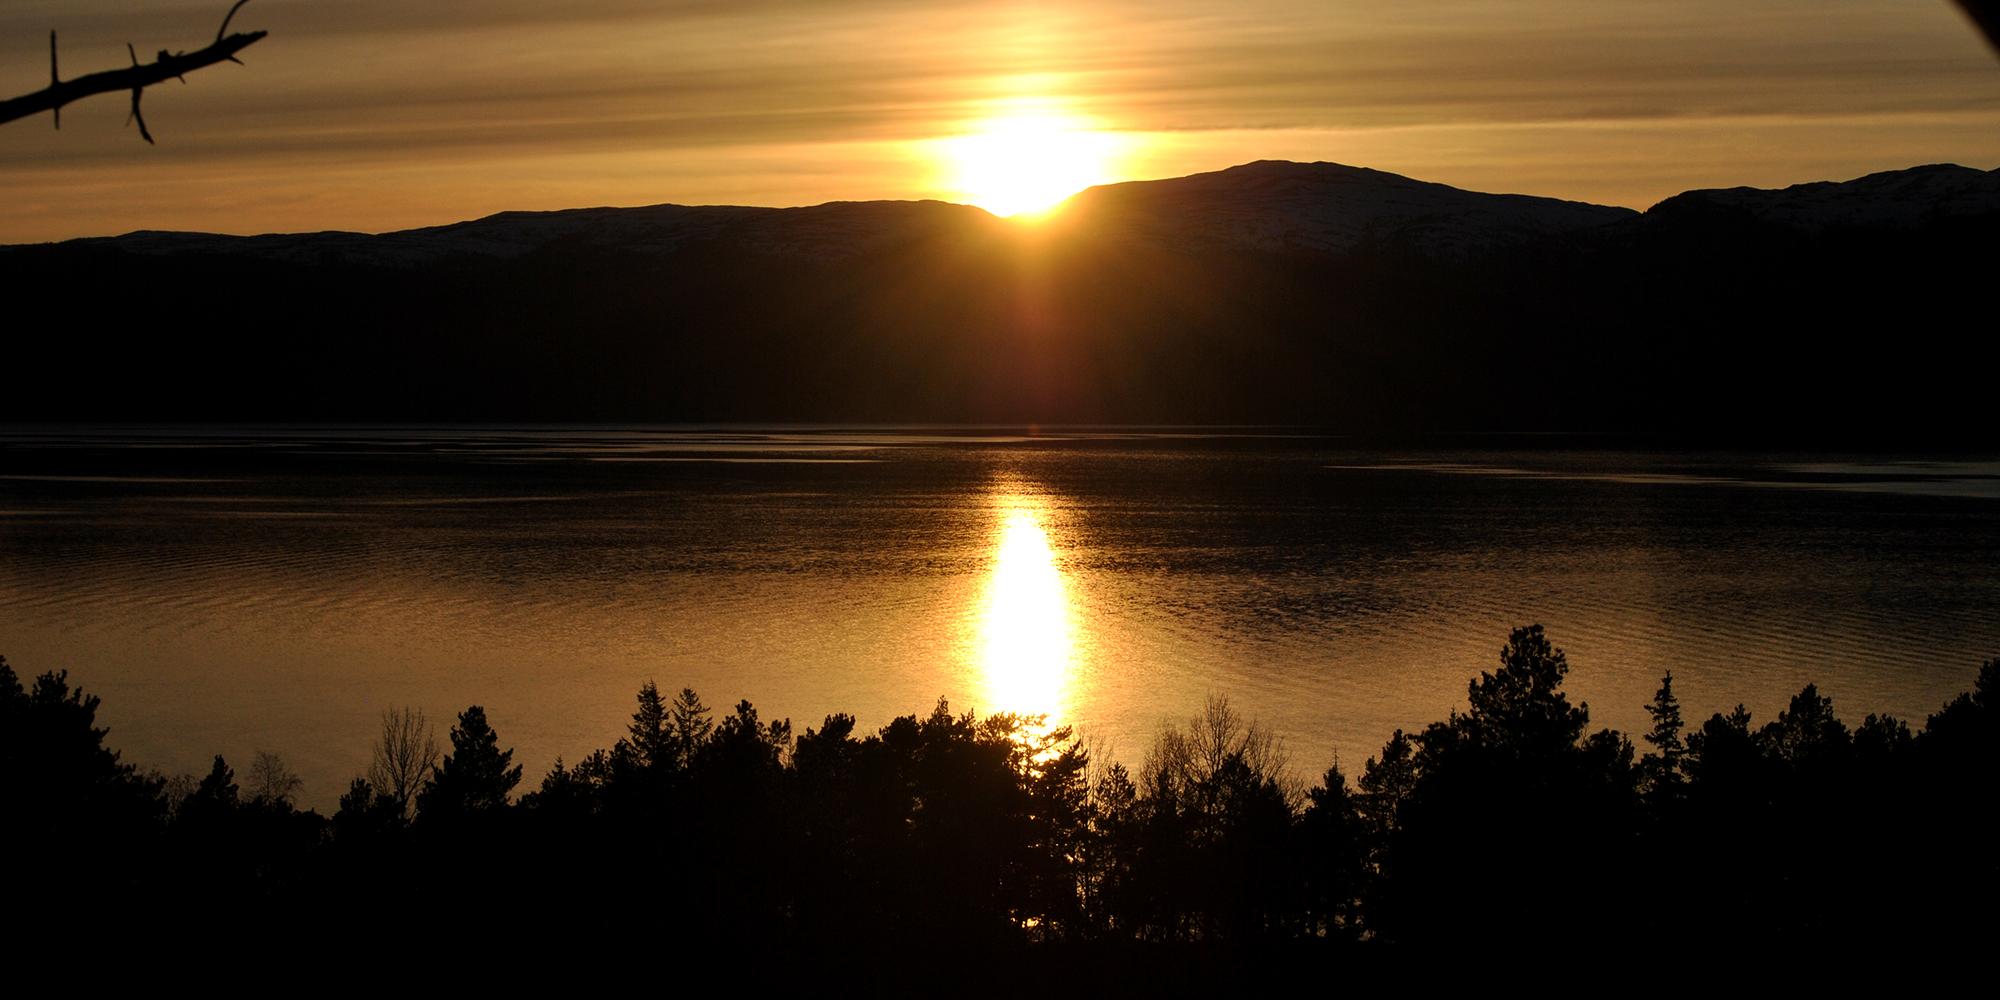 Sunset by Spettspiret cabin. Copyright: Letnes Gård